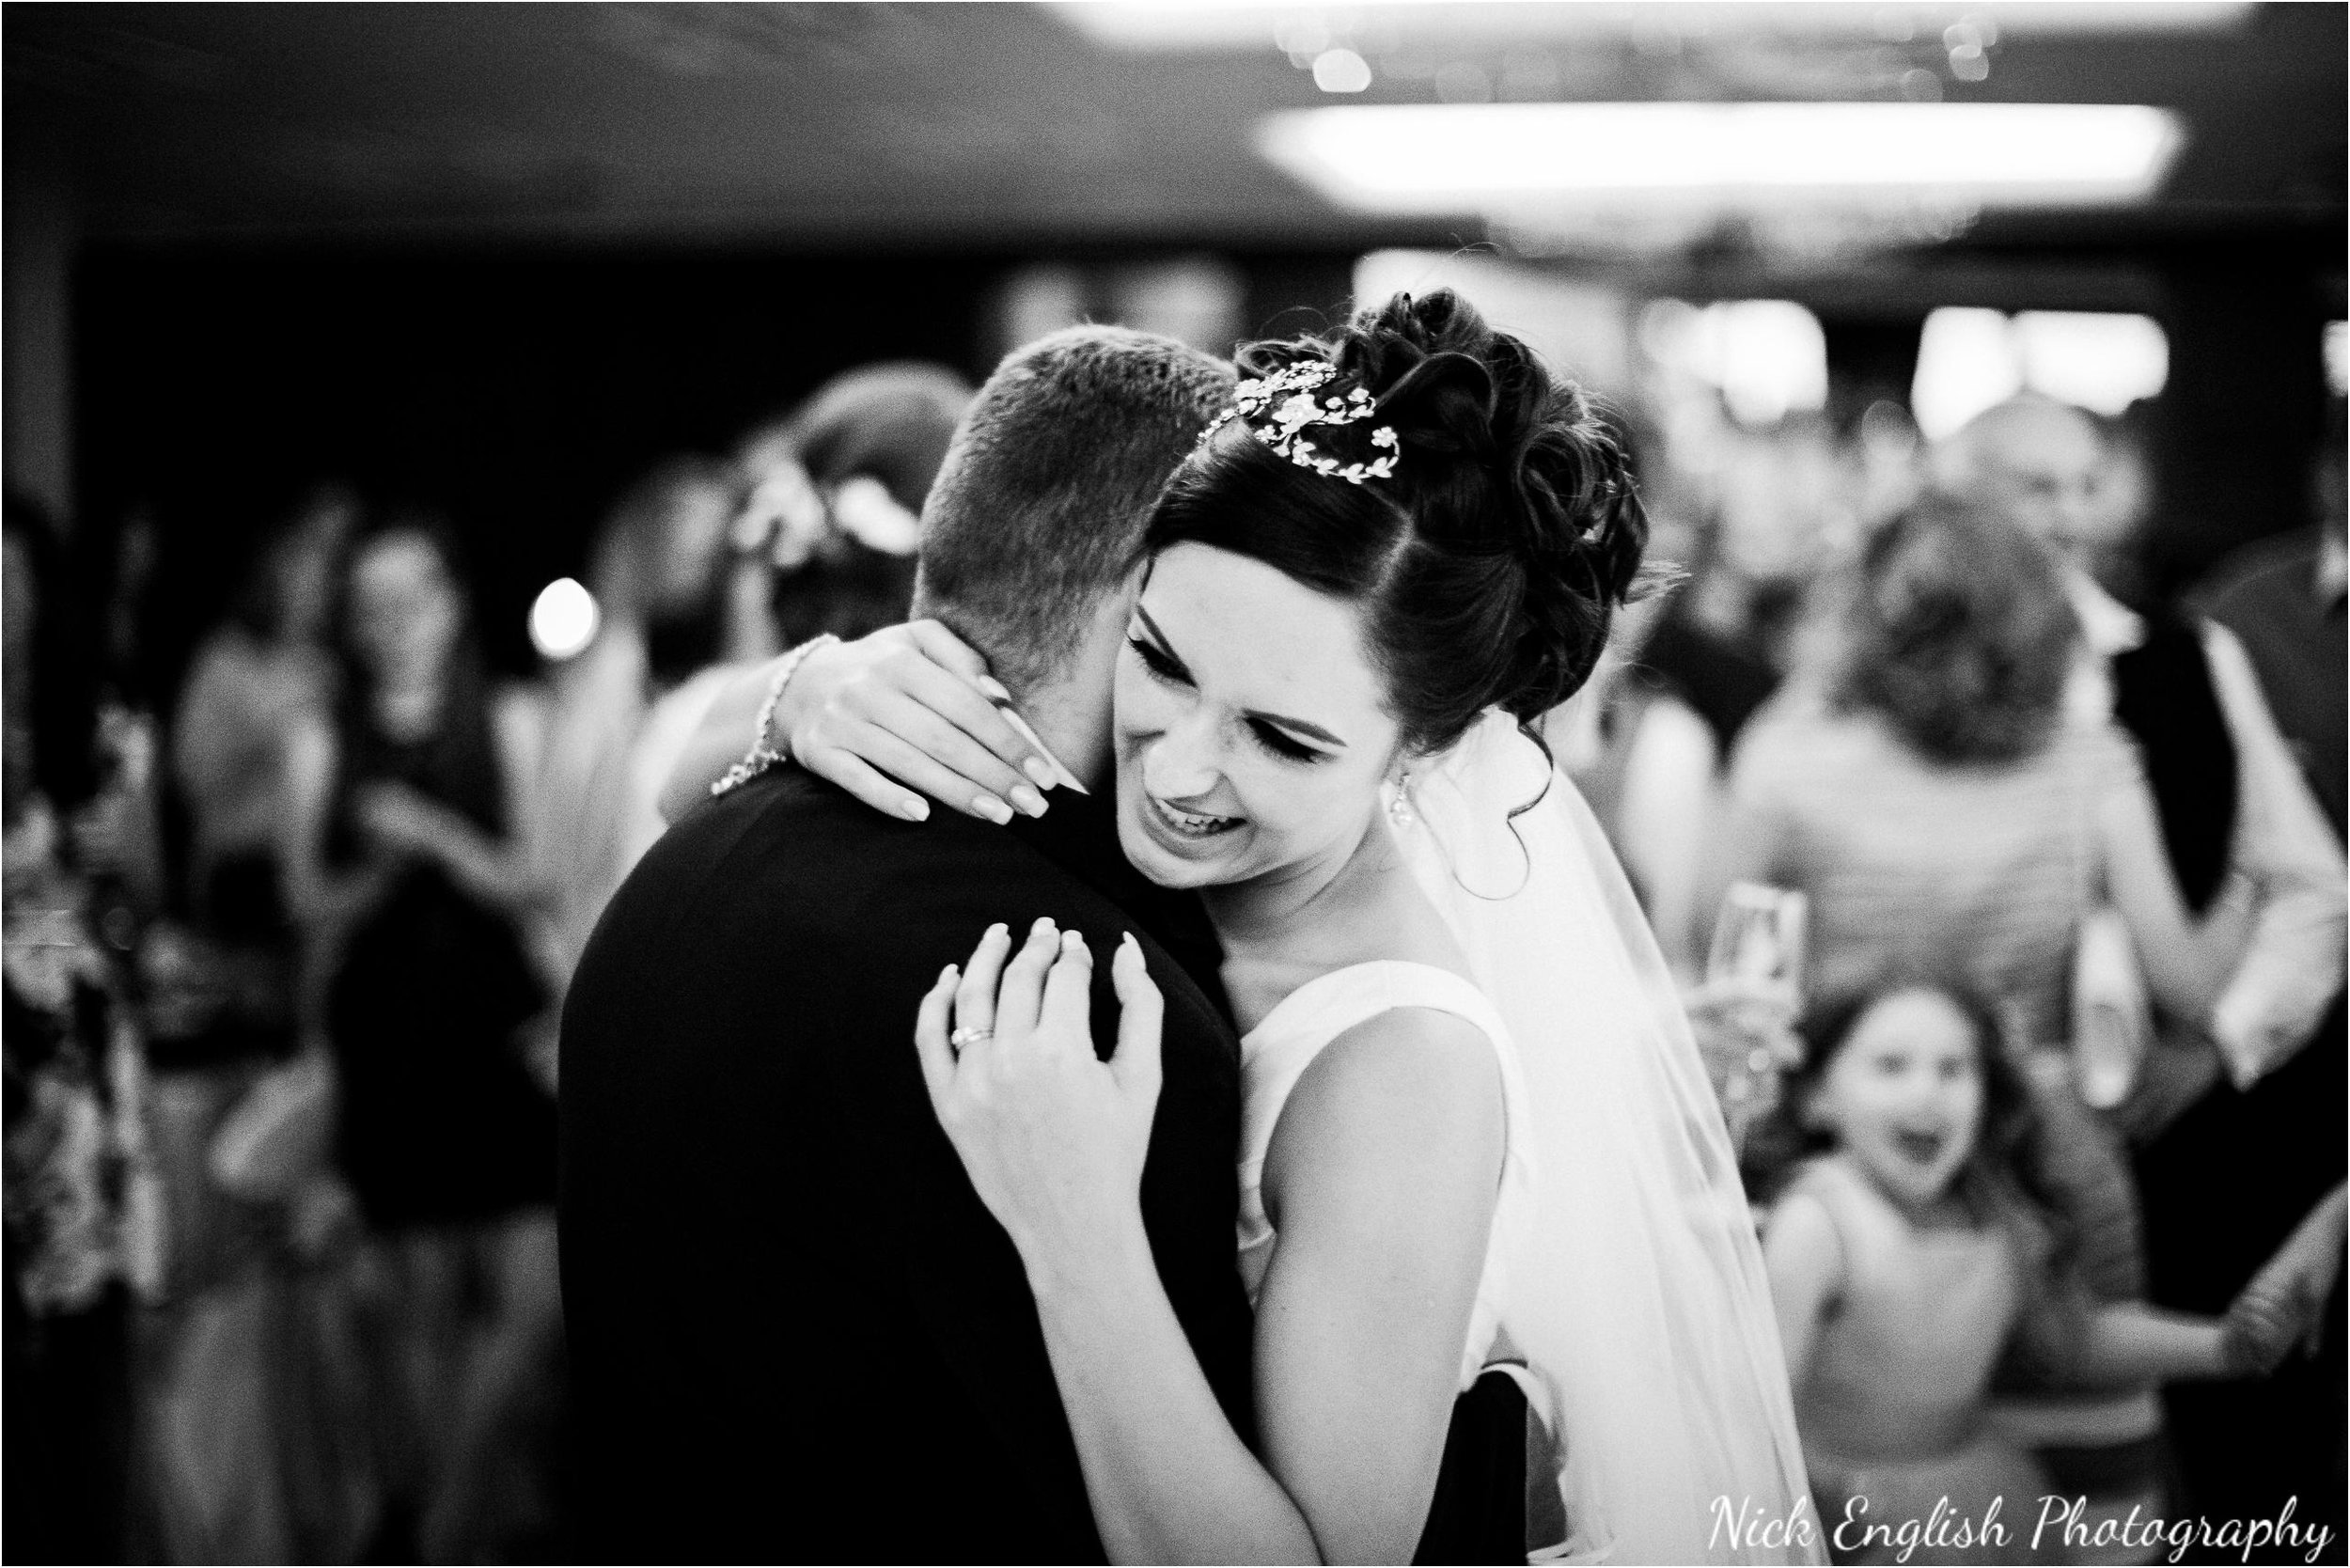 Emily David Wedding Photographs at Barton Grange Preston by Nick English Photography 228jpg.jpeg